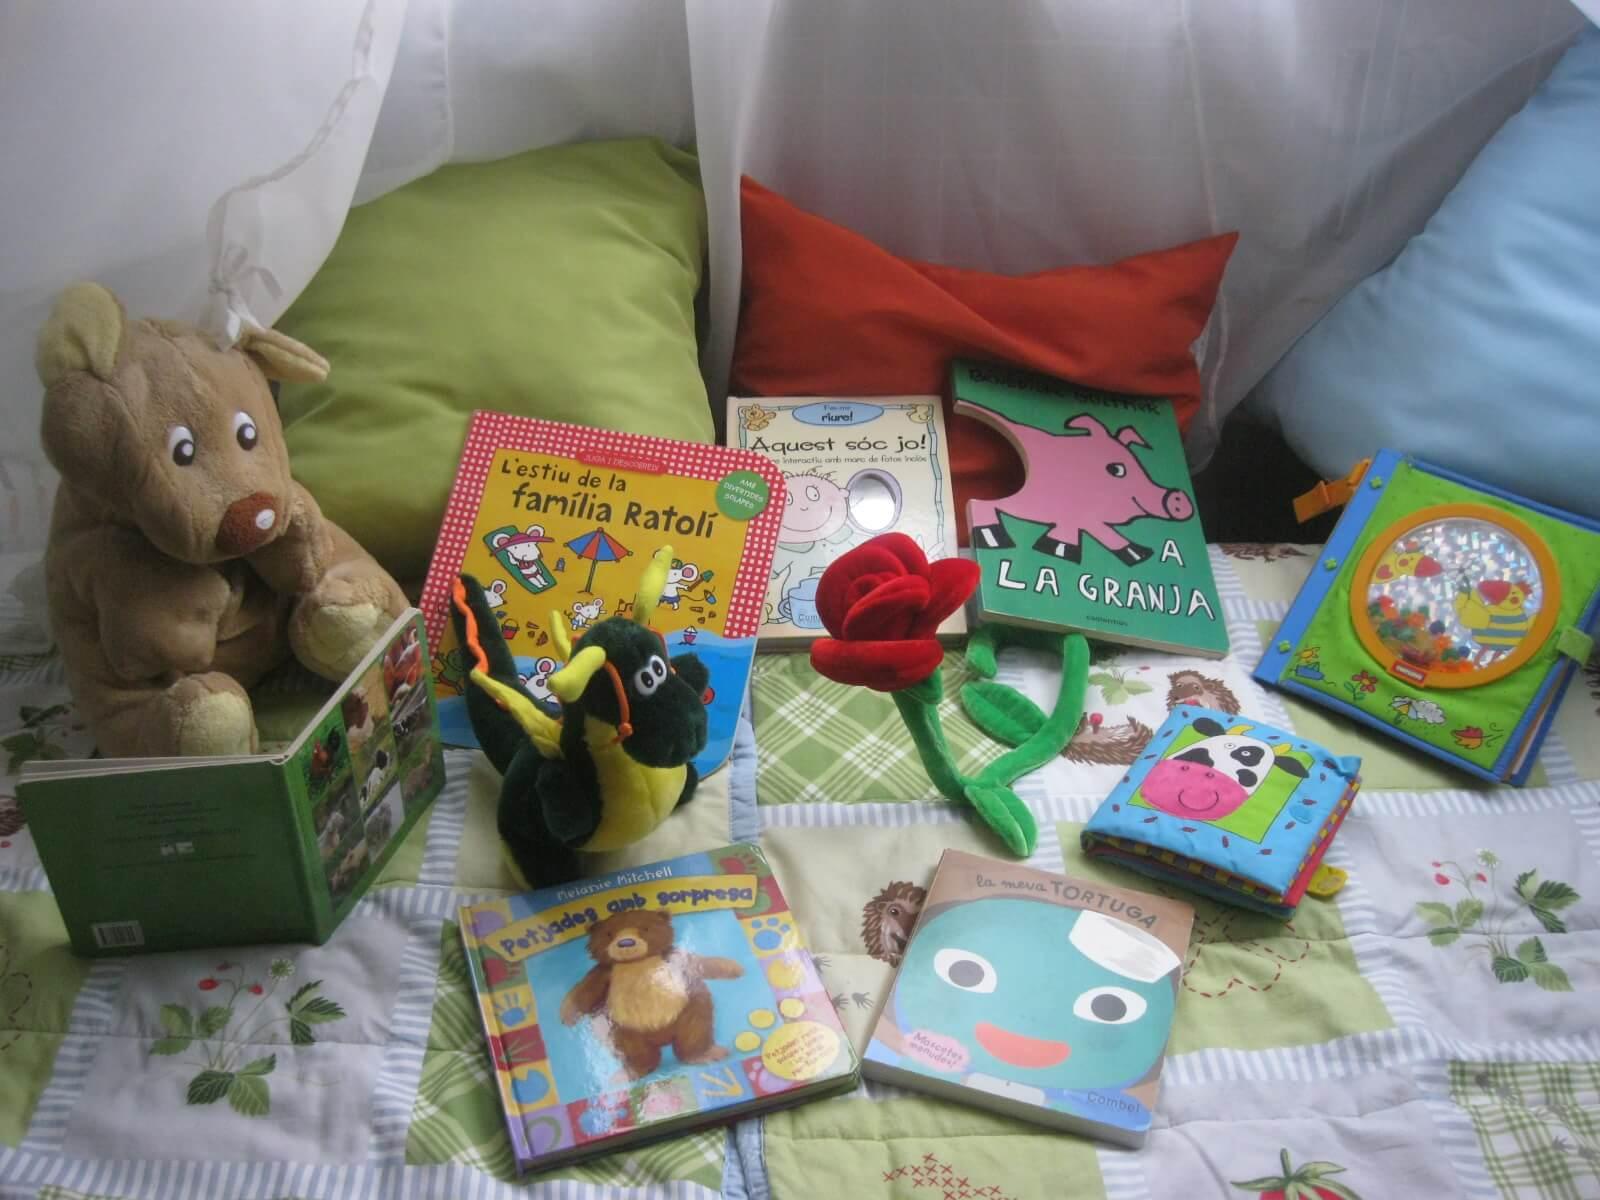 raco contes-1 - Escola Infantil Magnòlia